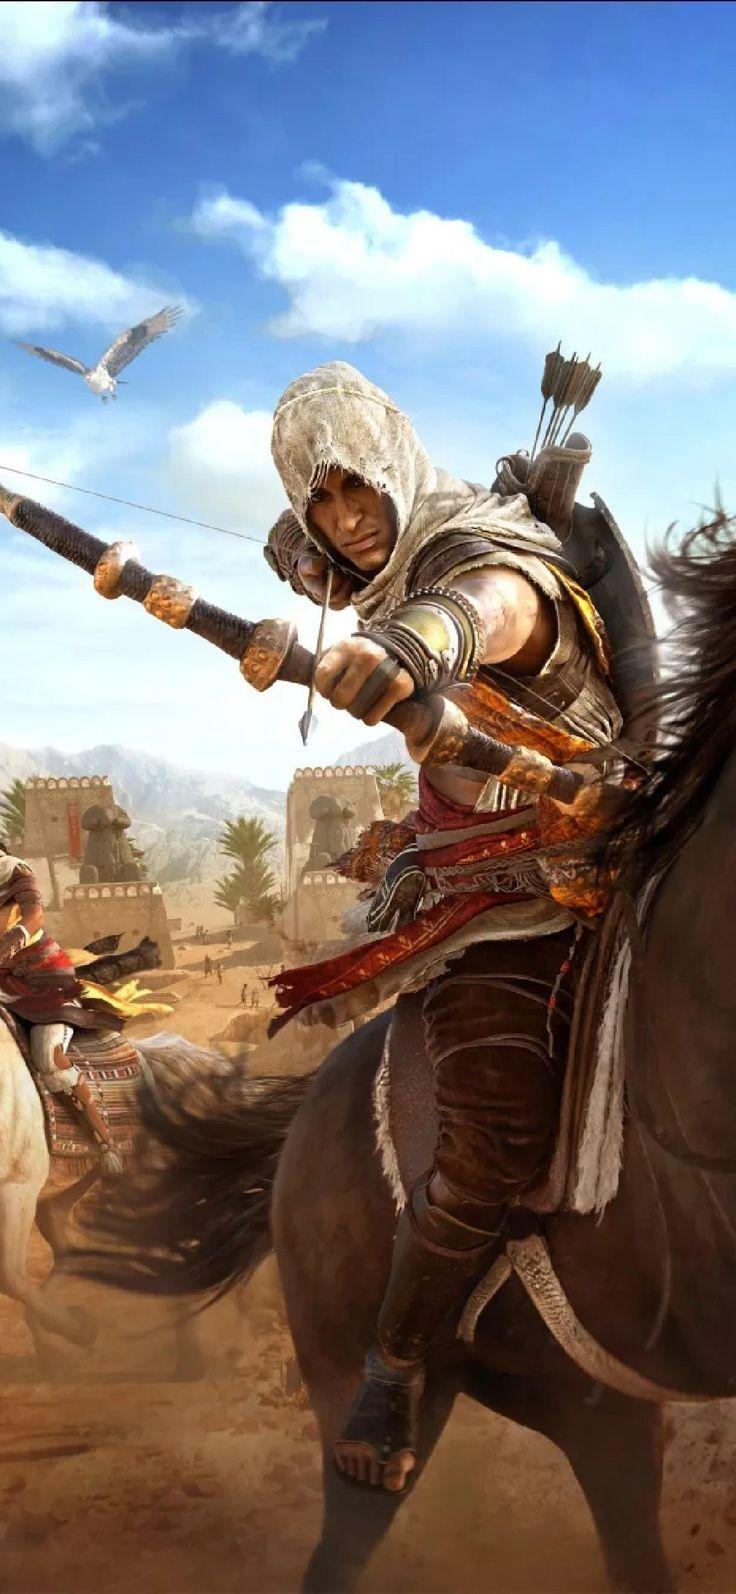 Assassins creed Origins in 2020 Assassin's creed